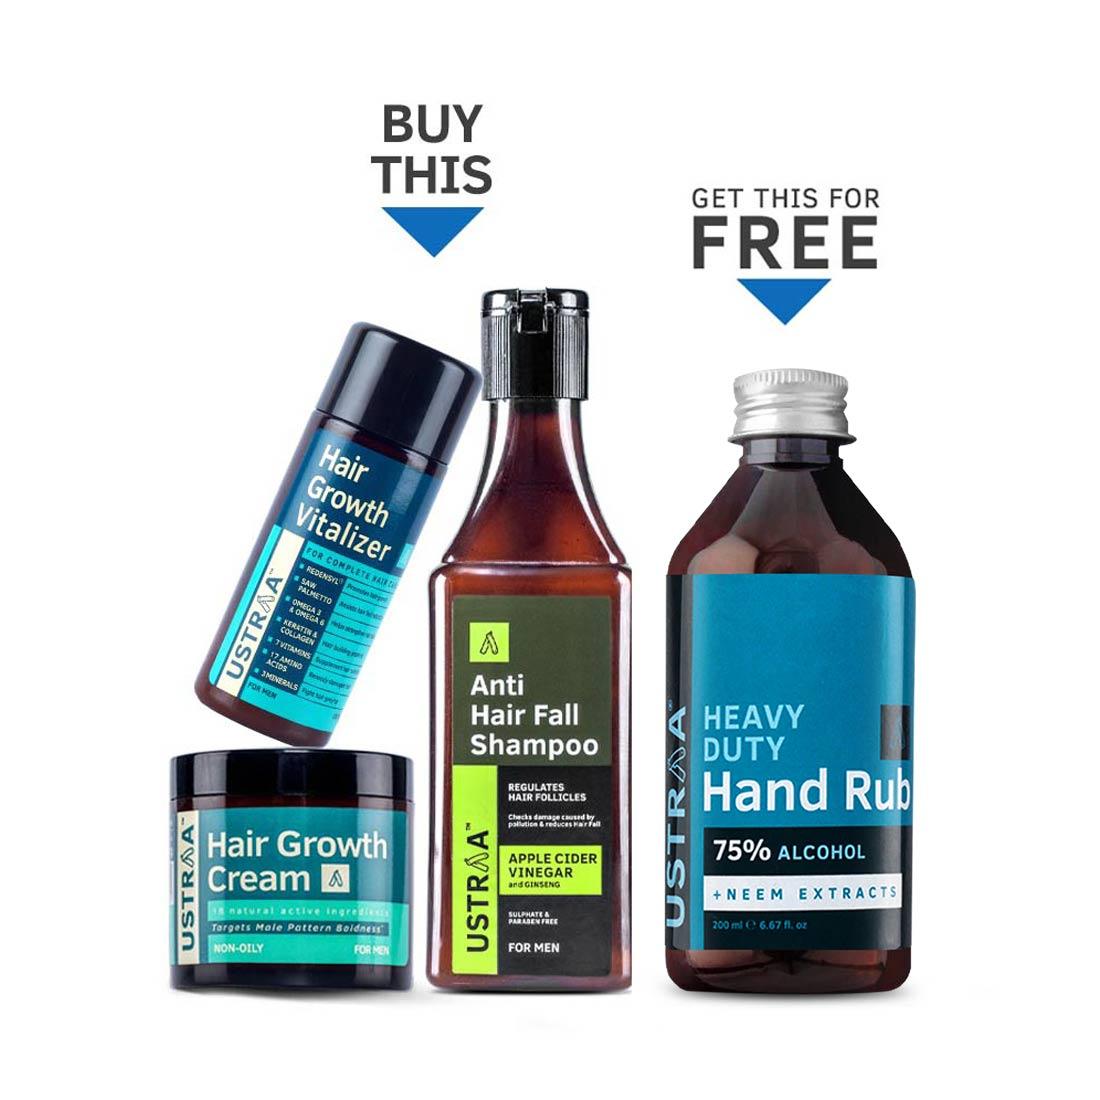 Hair Growth Kit (Get Hand Rub Free)